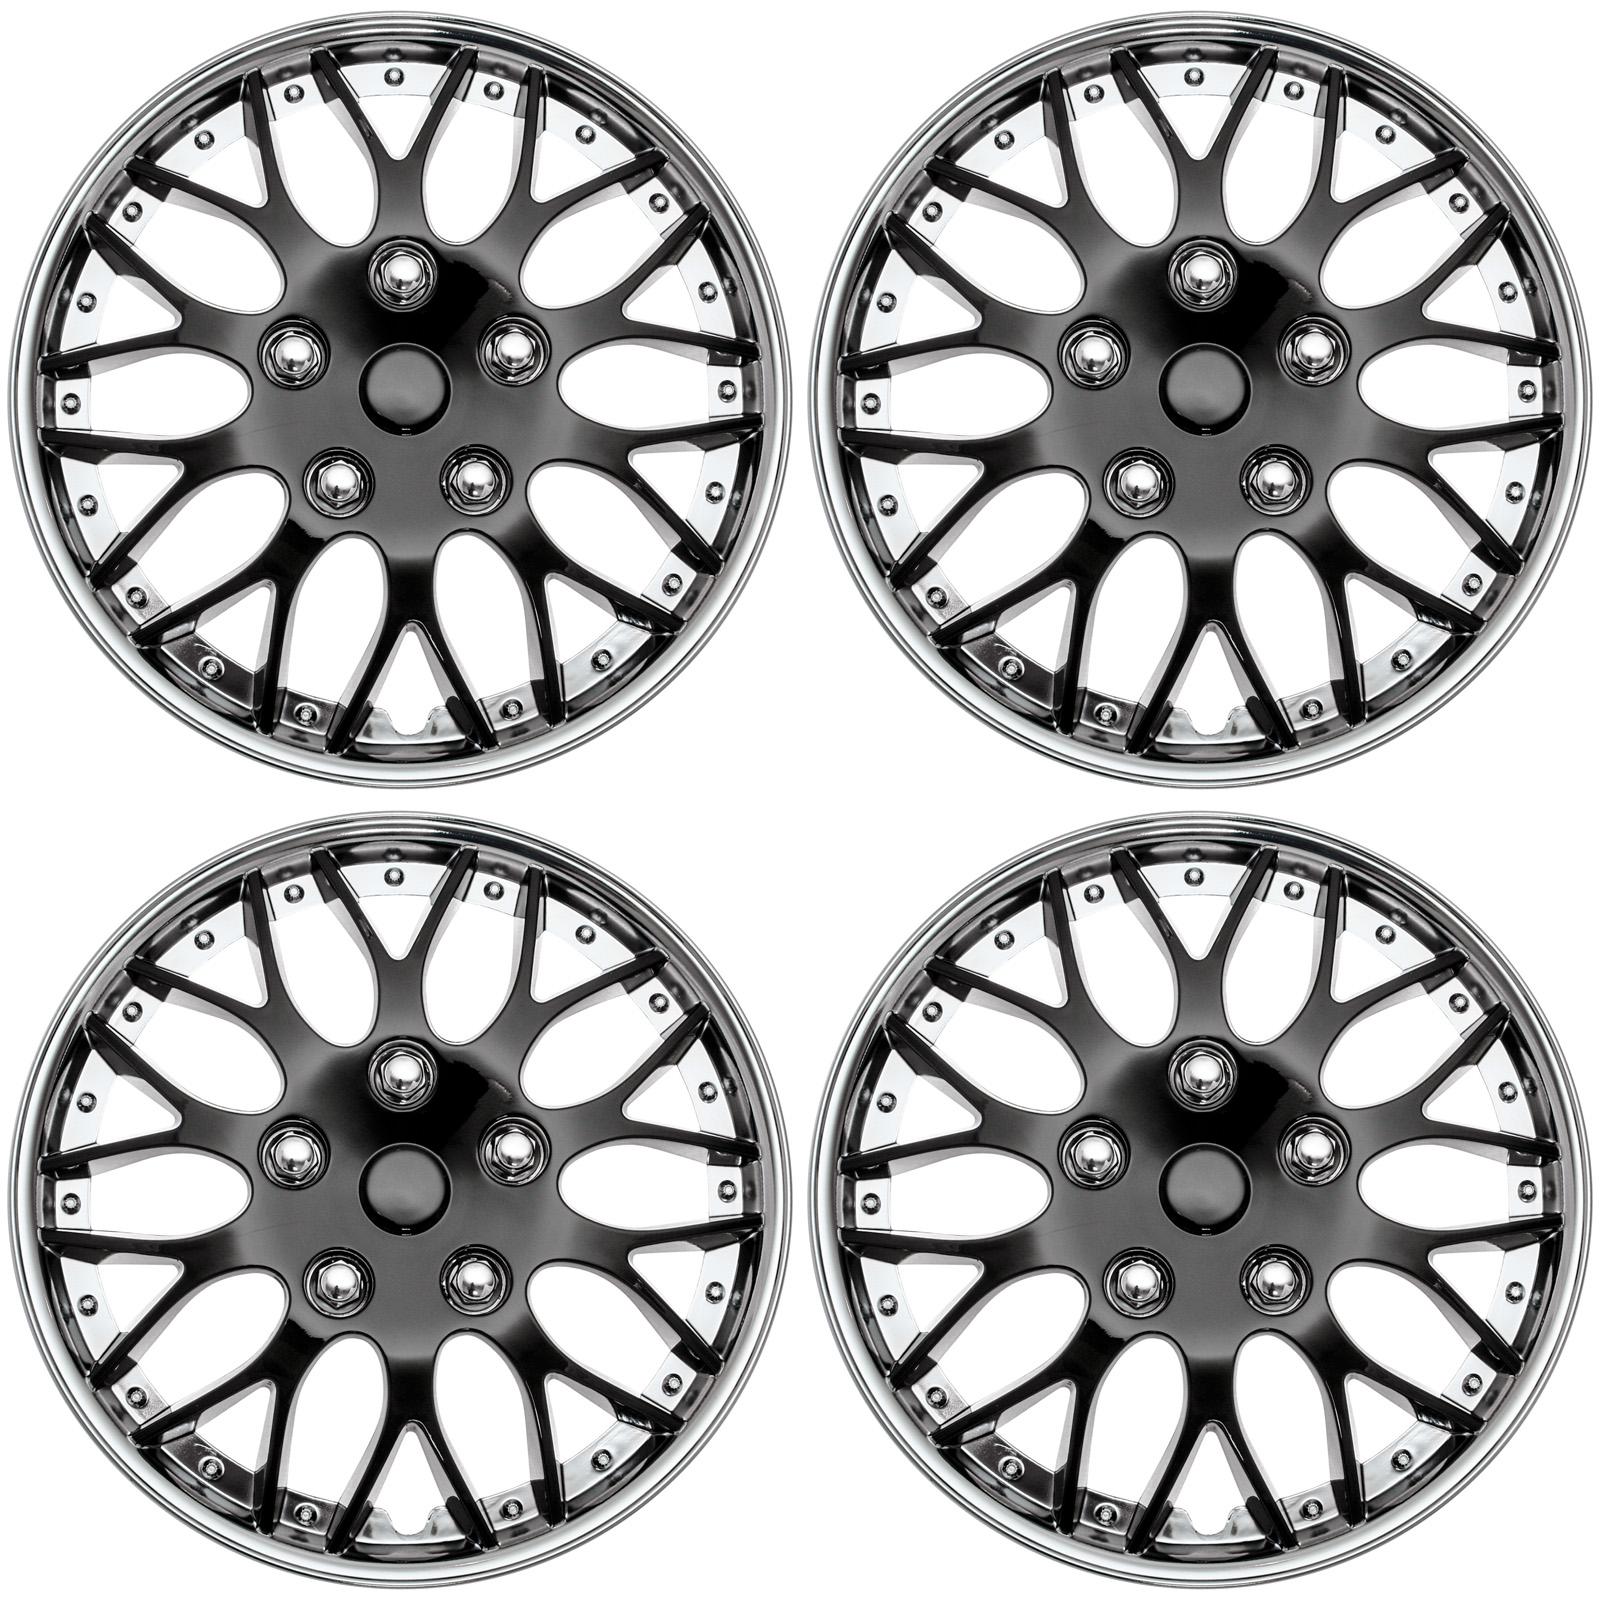 "Cover Trend (Set of 4), Aftermarket, 16"" Shiny Black W/ Chrome Trim Hub Caps Wheel Covers"